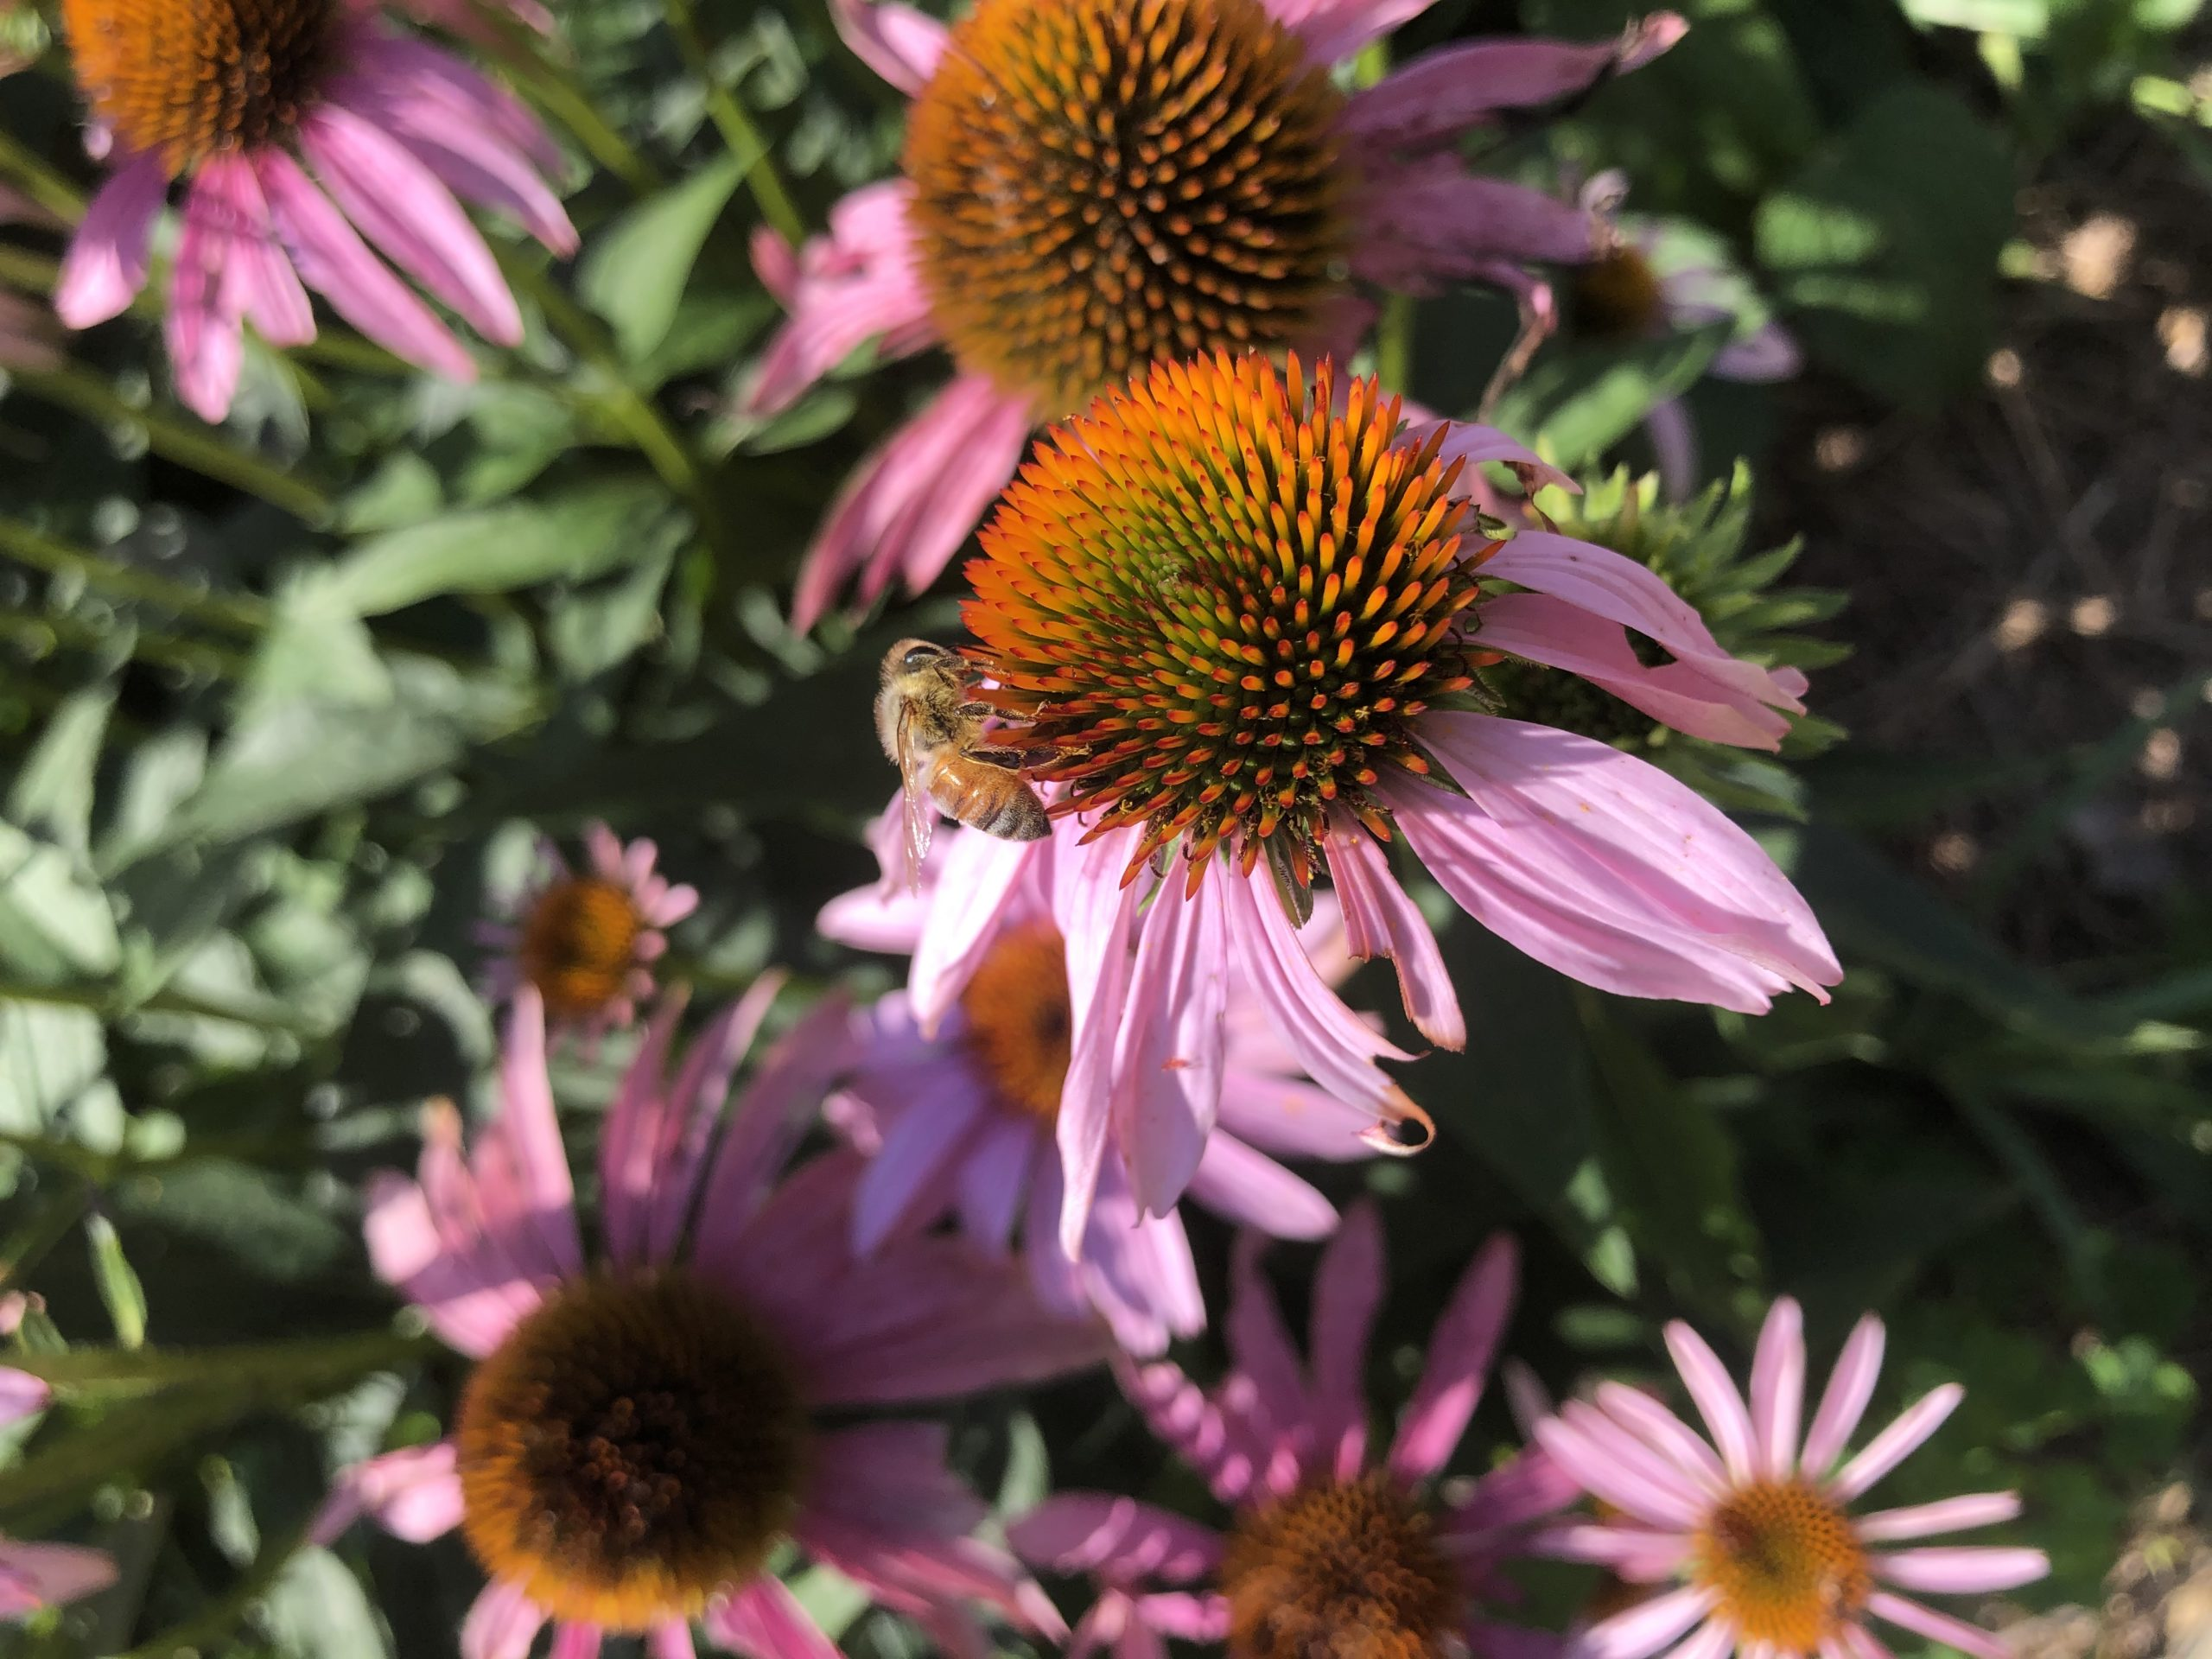 Honey bee on echinacea flower